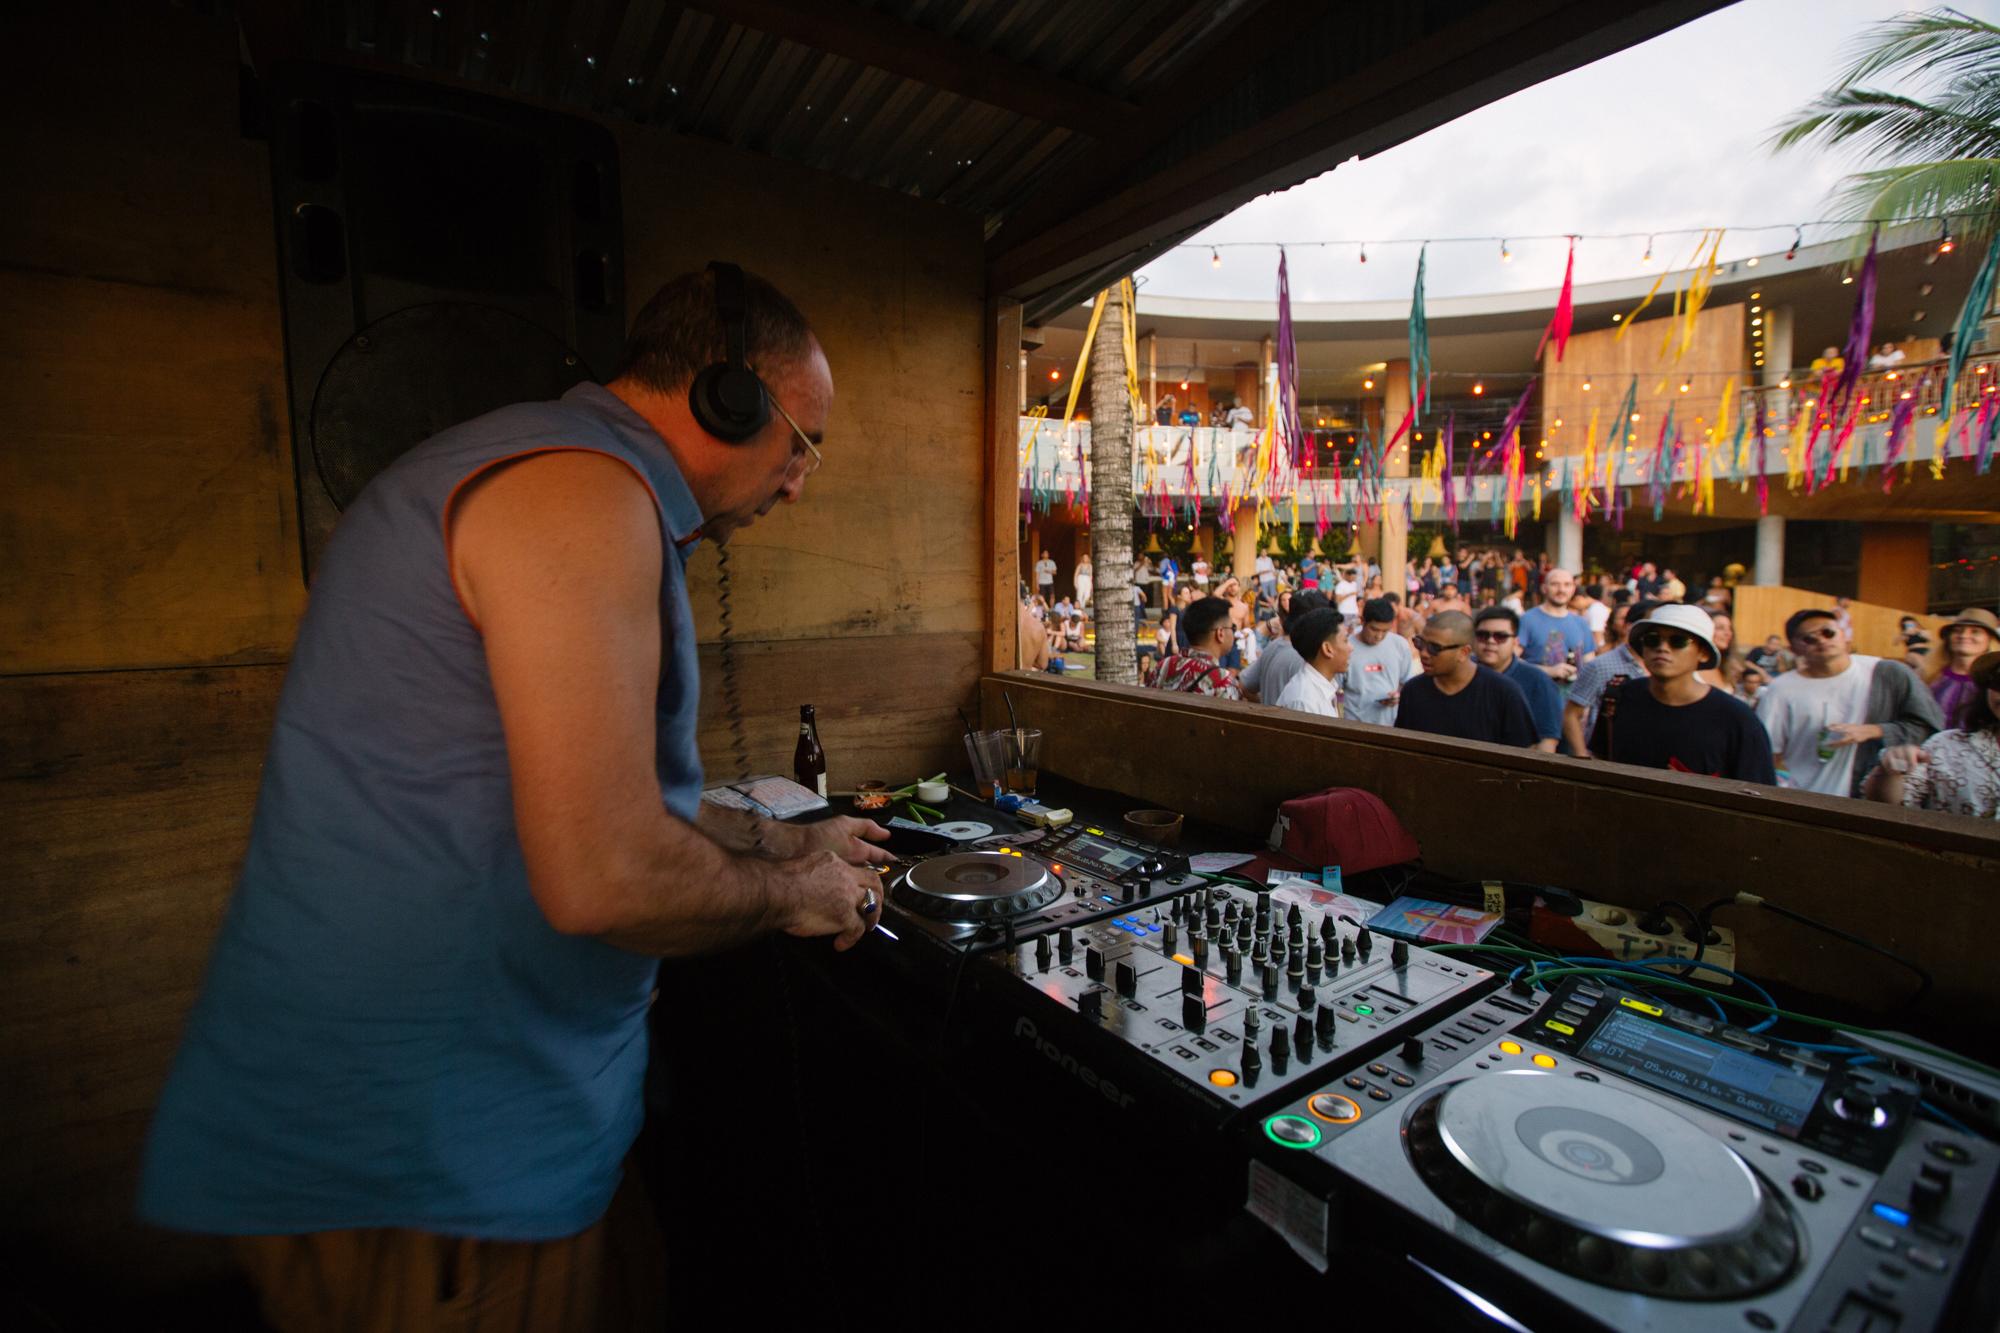 Jose Padilla - Potato Head - Bali - Dancefloor